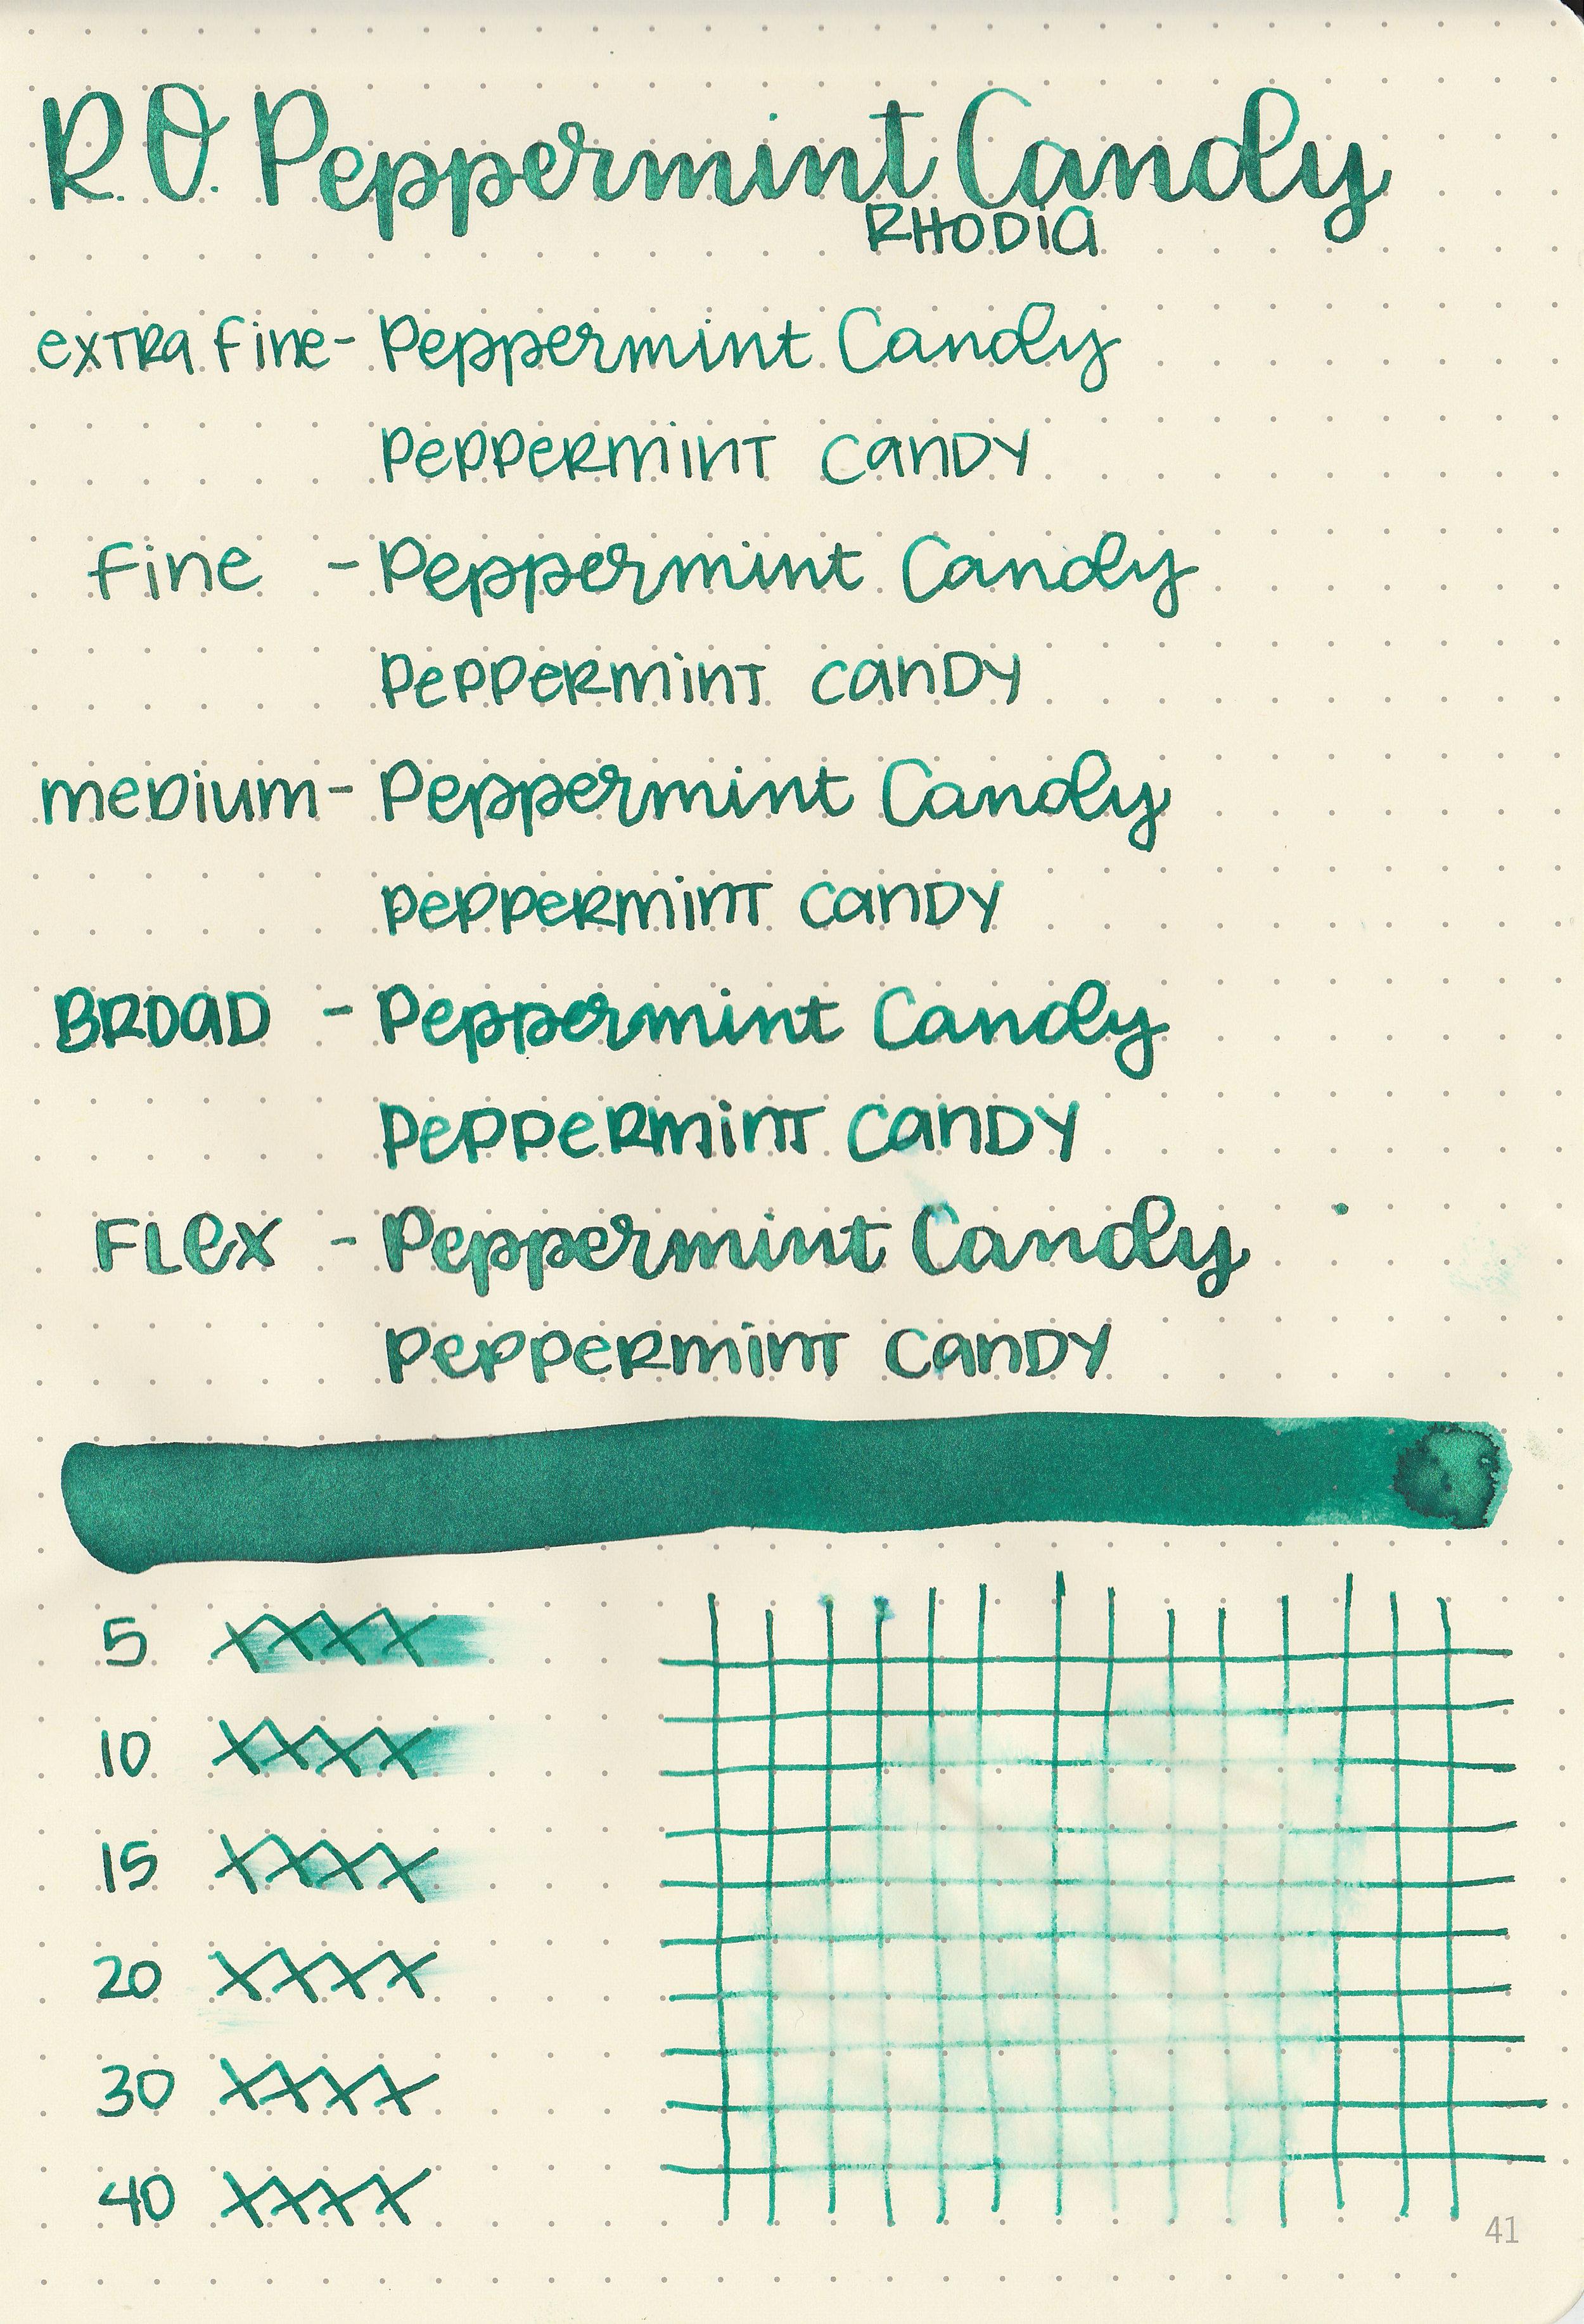 ro-peppermint-candy-5.jpg